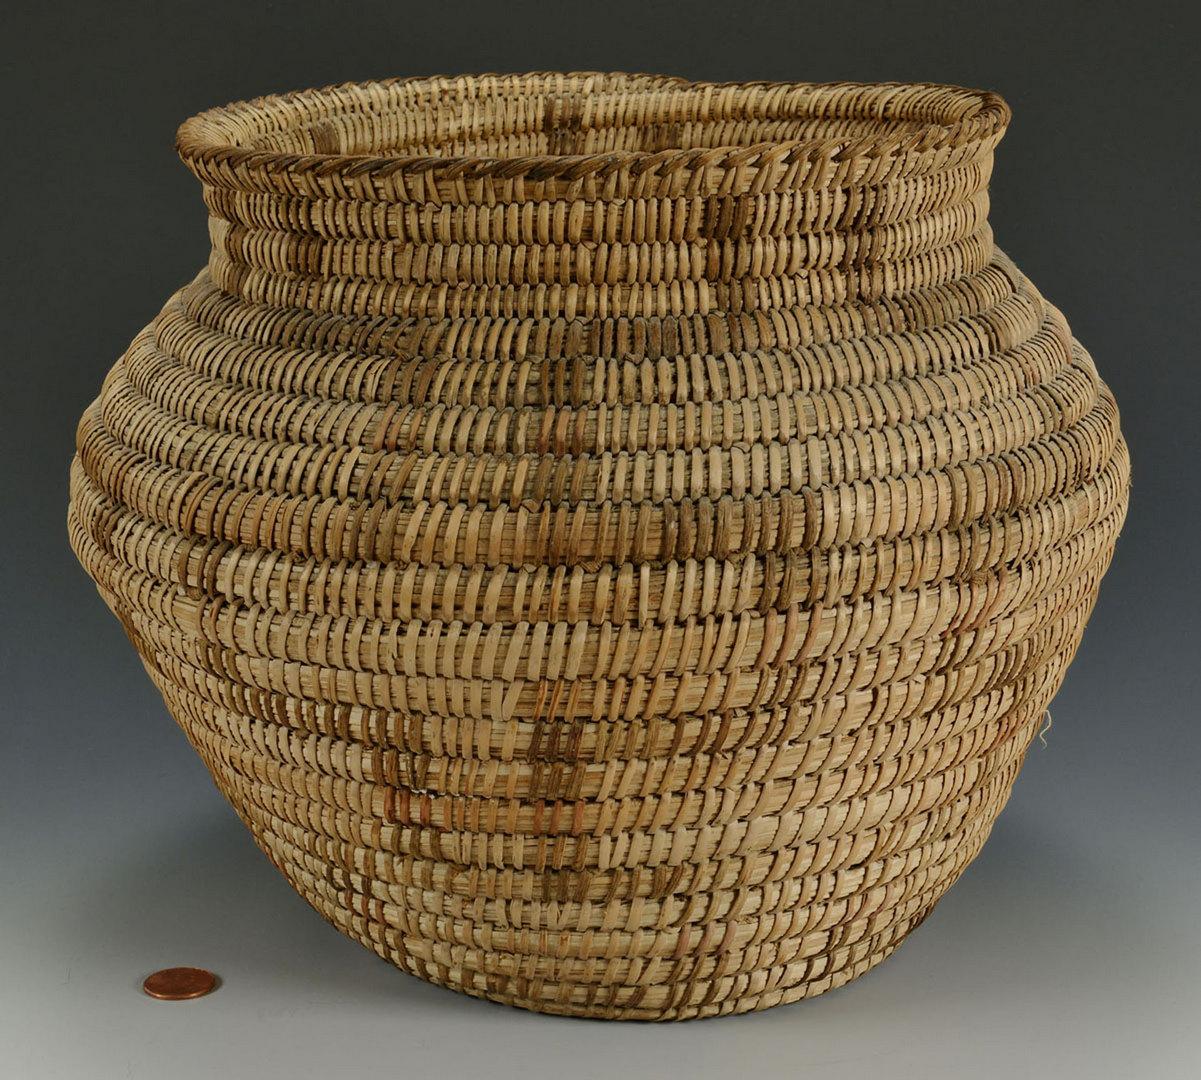 Lot 392: Native American Pima Basket, Olla Form